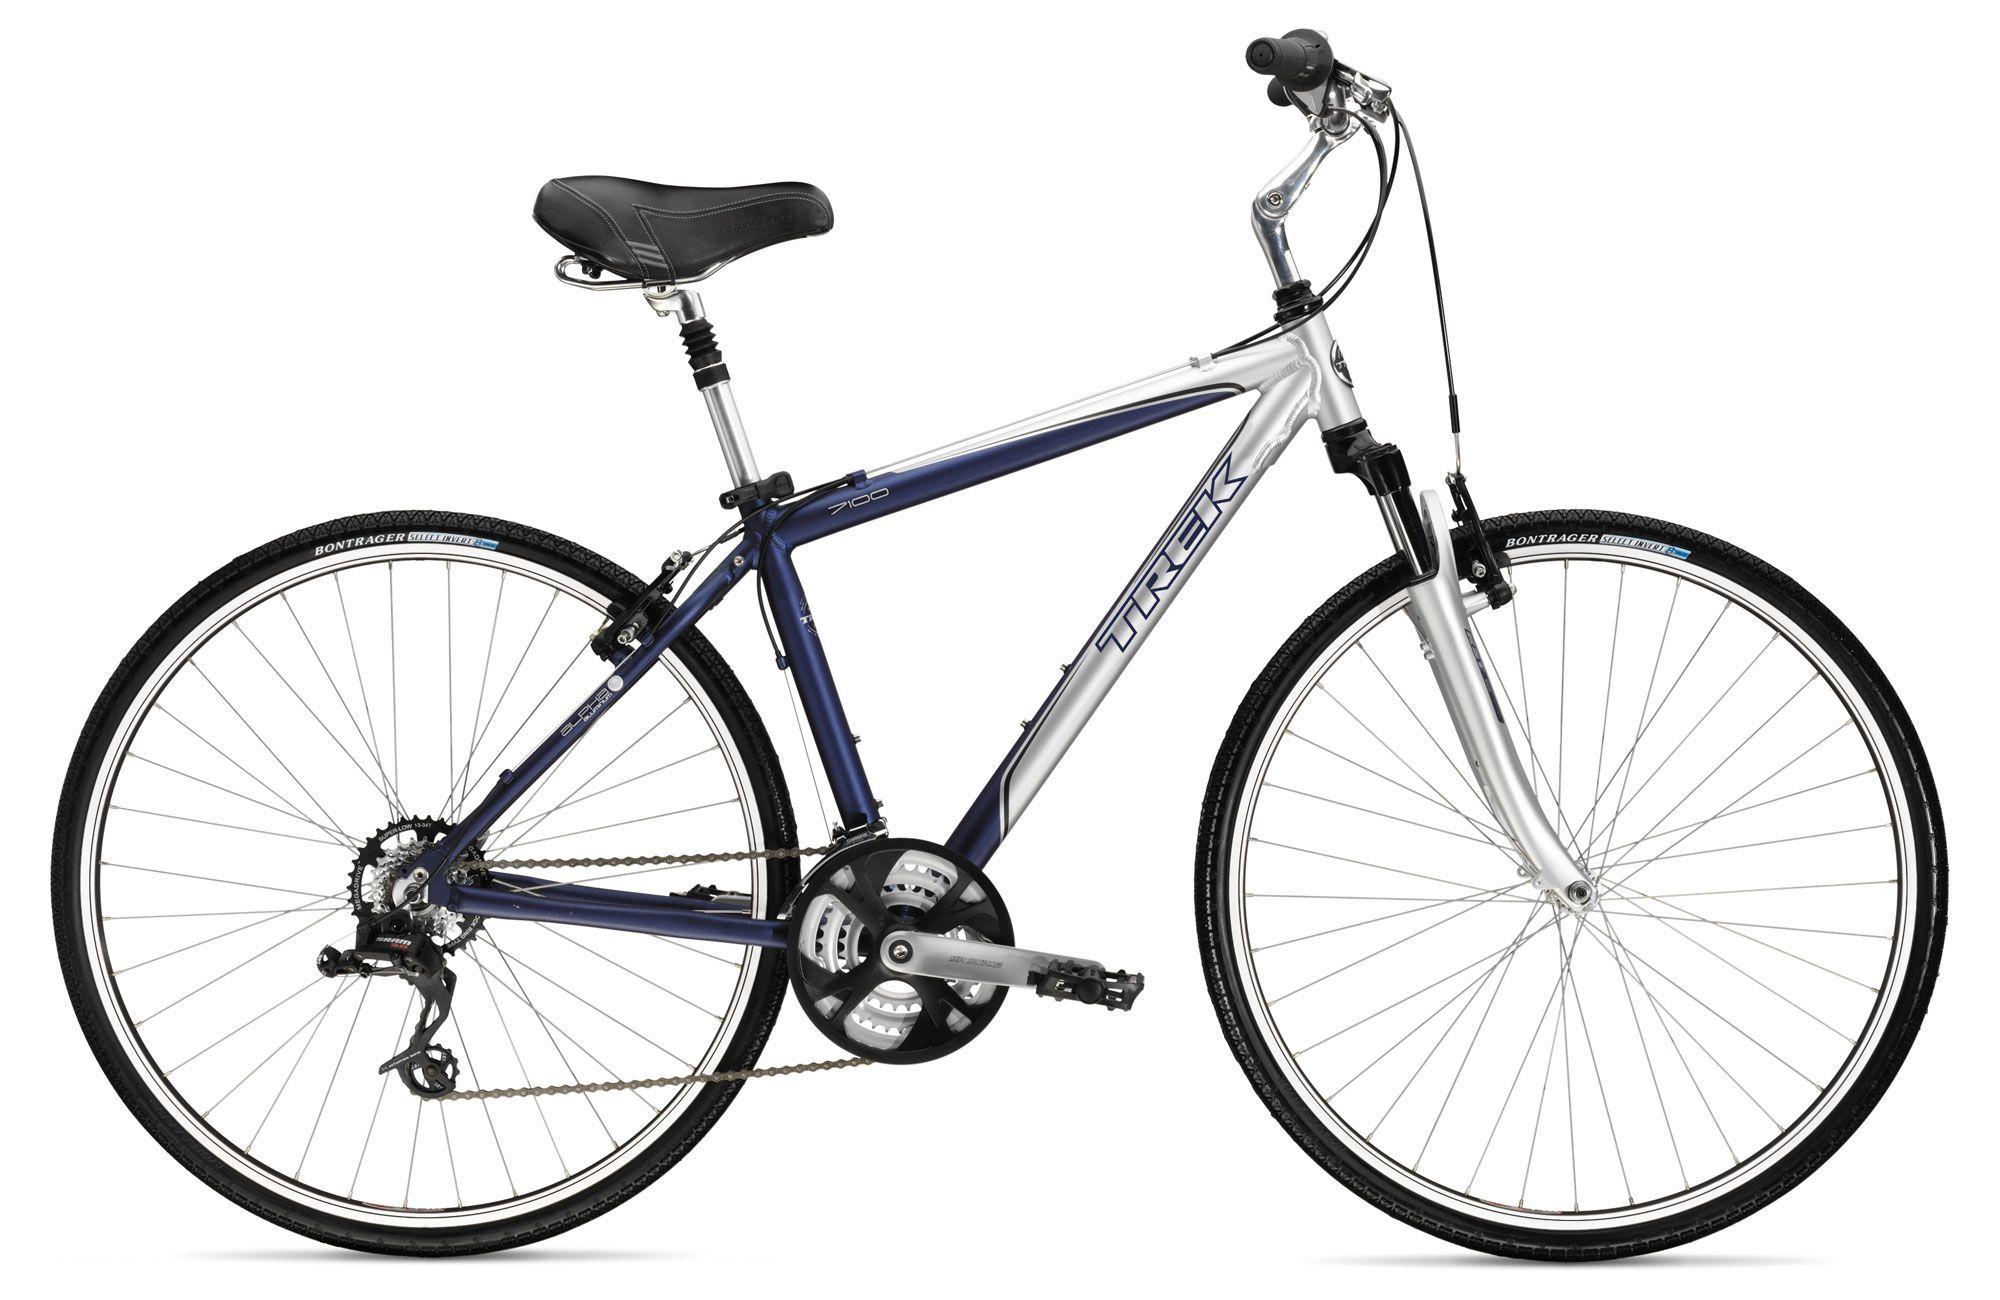 Trek 7100 Mens Hybrid Touring Bike 2009 Trek Bikes Touring Bike Cool Bikes